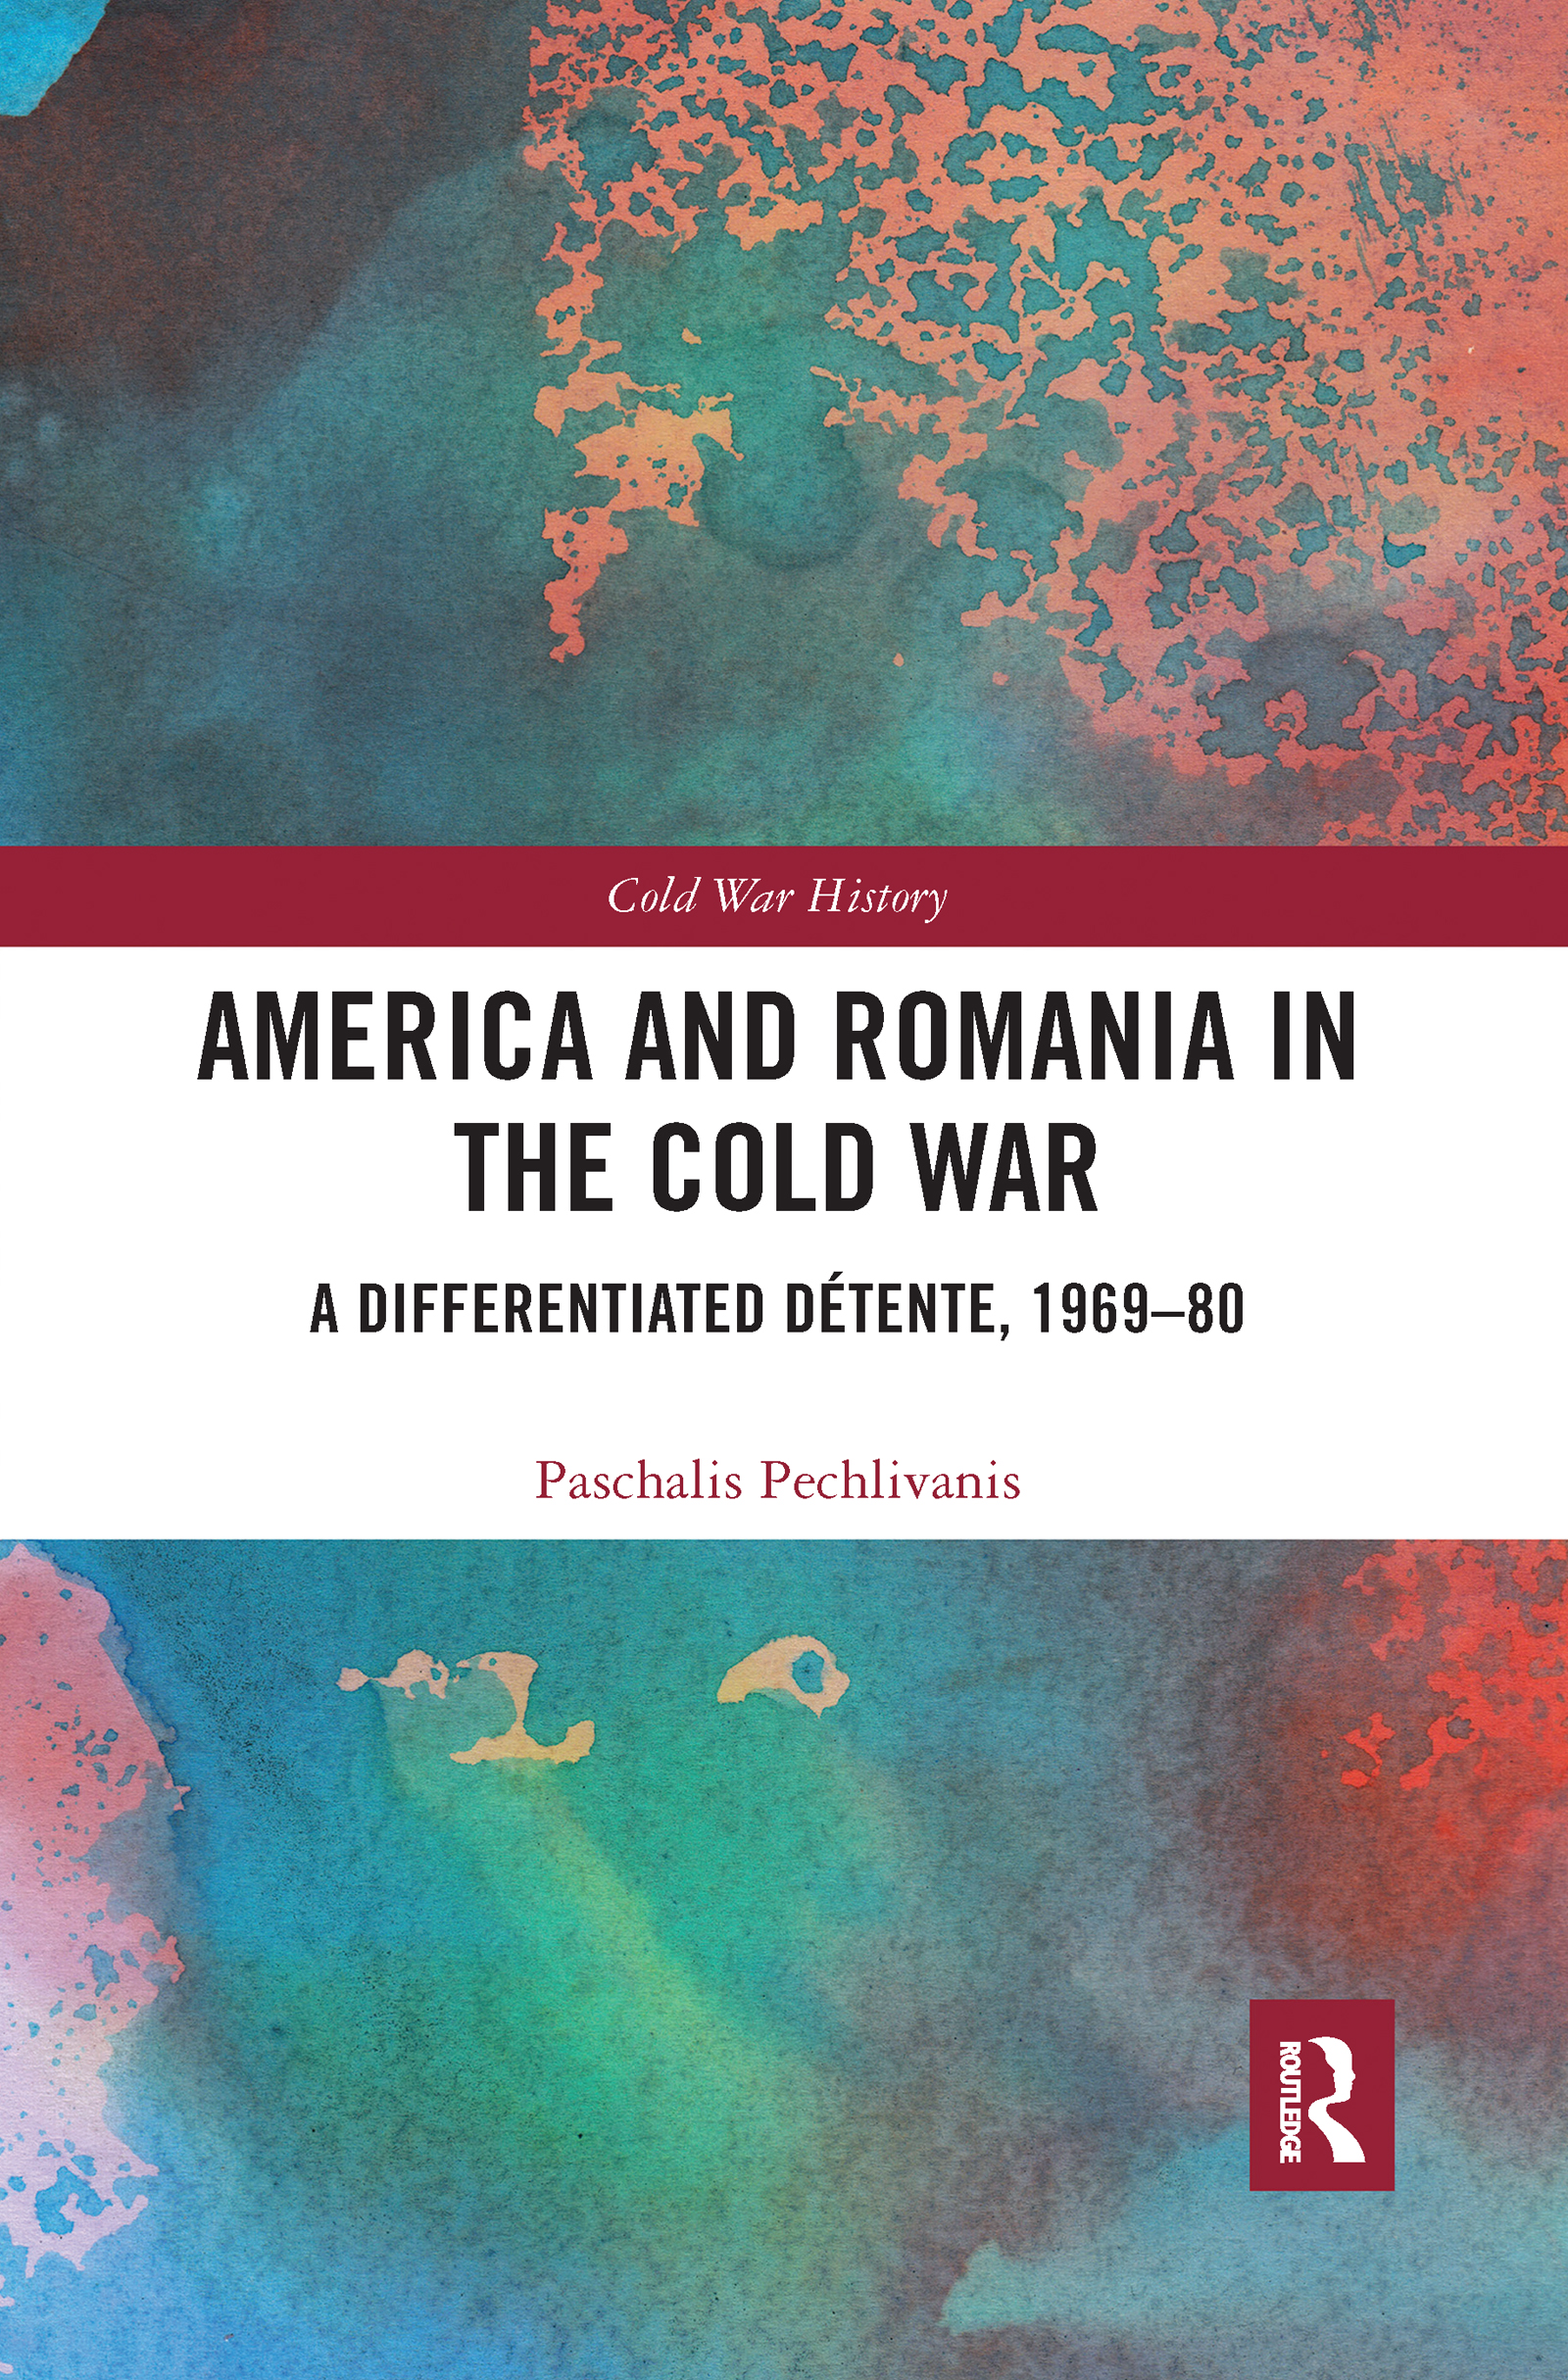 America and Romania in the Cold War